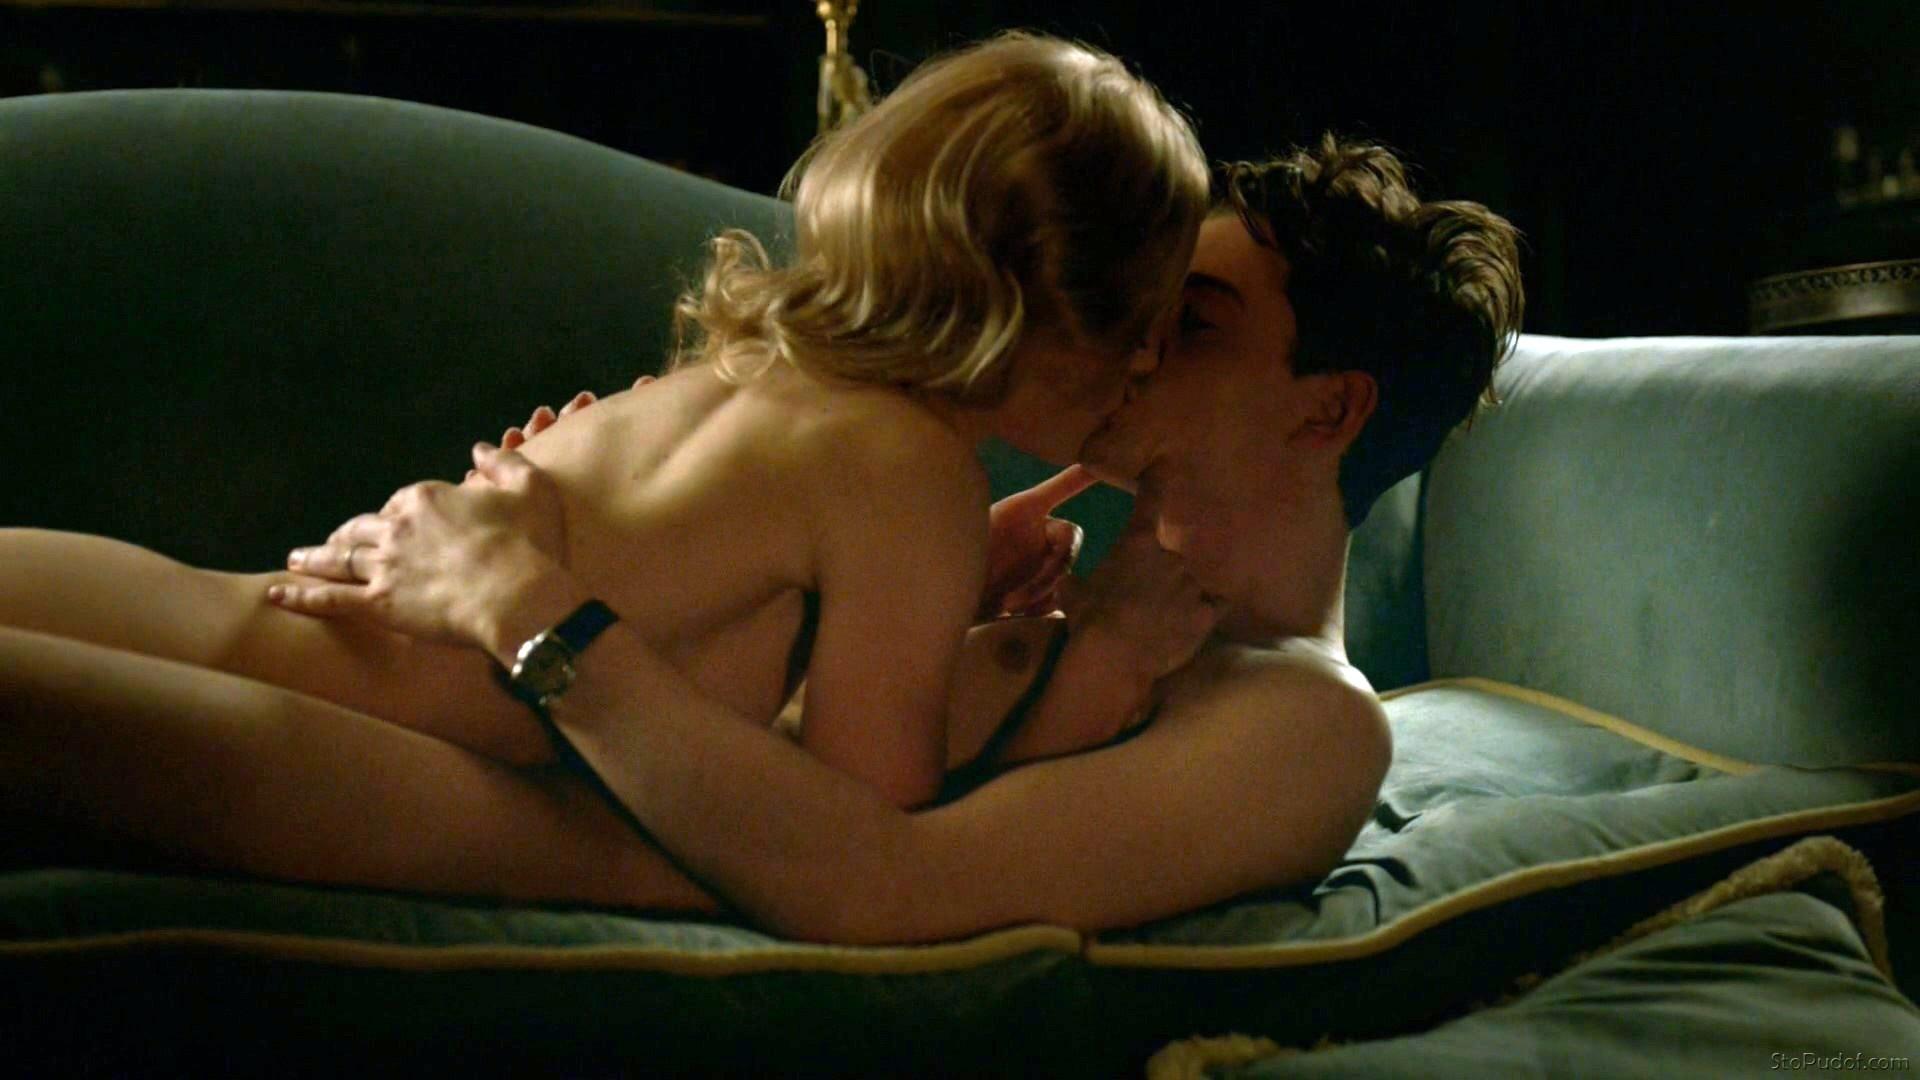 Kate bosworth leaked nude